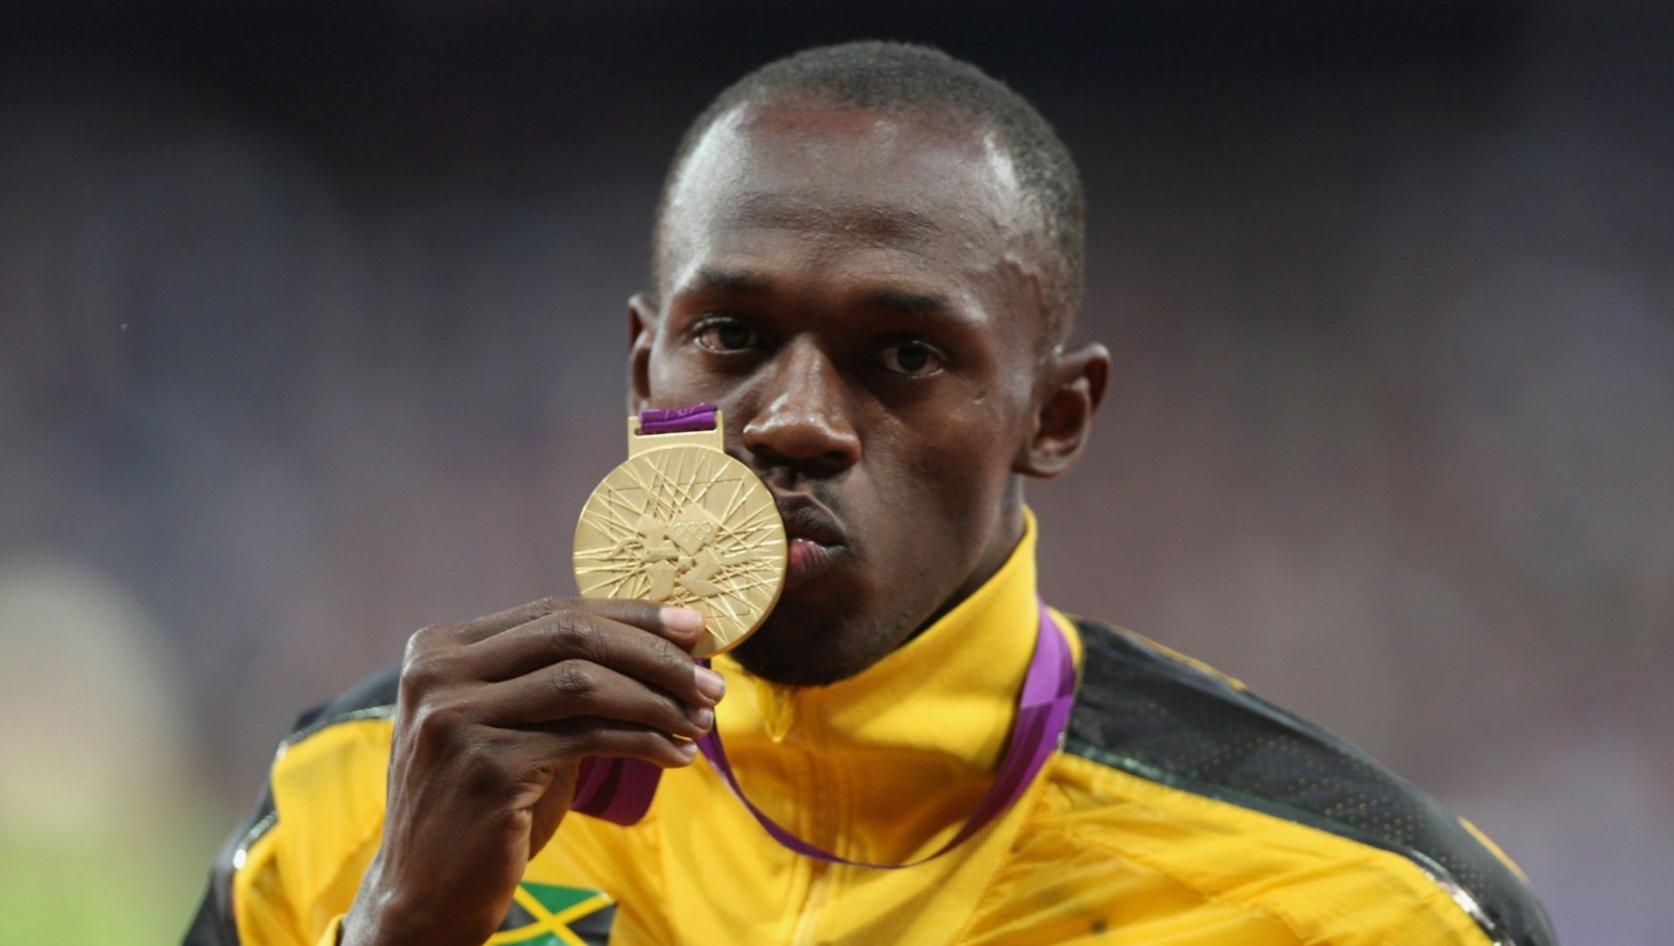 Usain Bolt Net Worth - RichestBlacks.com